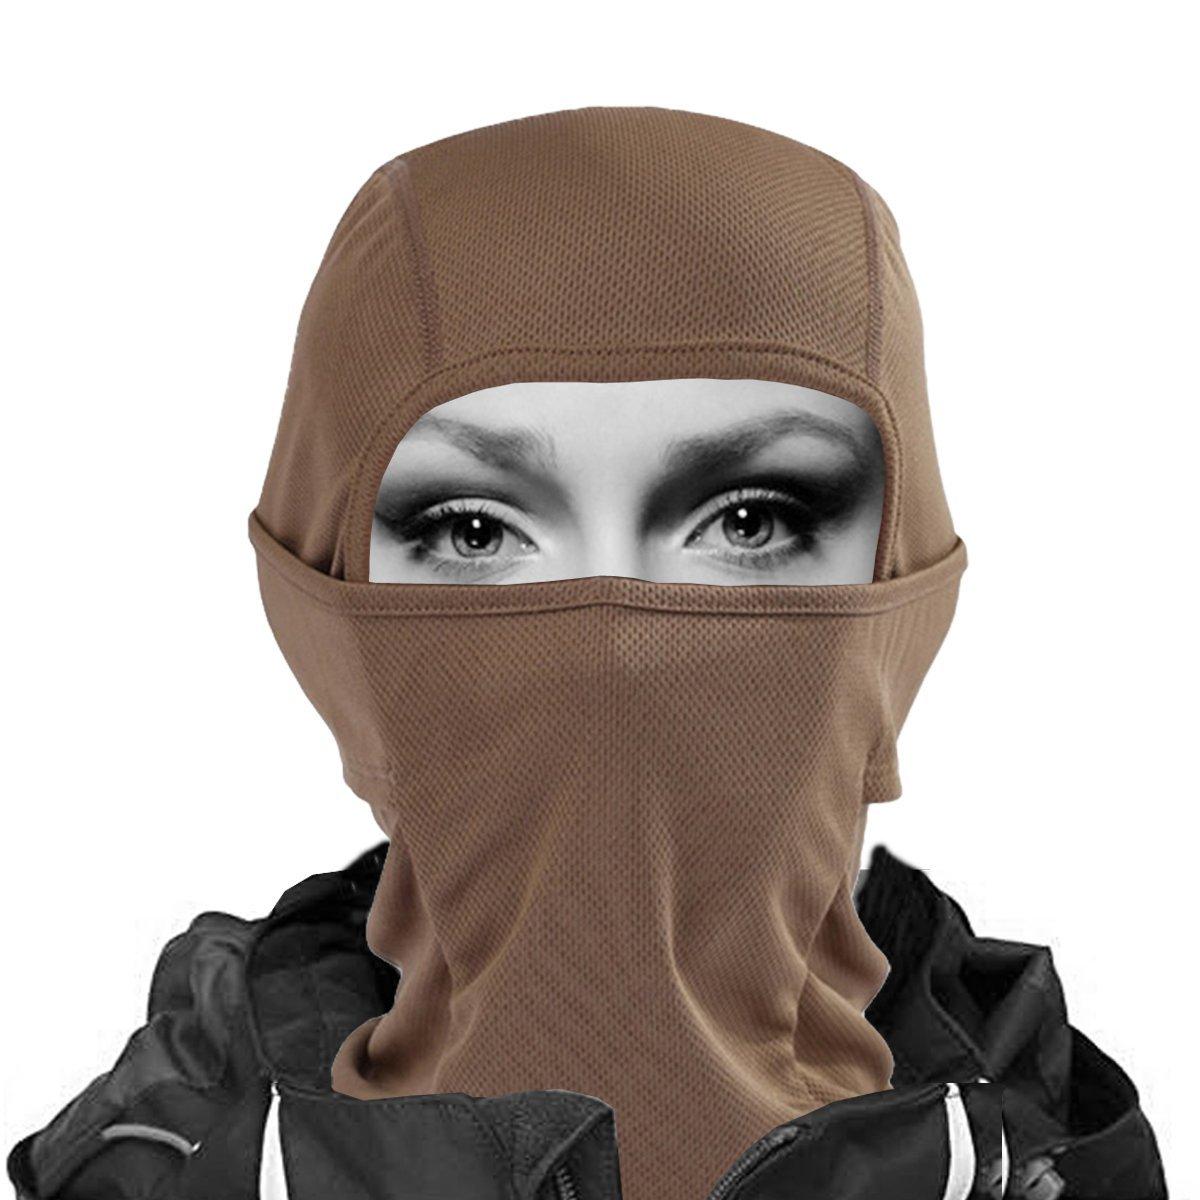 Walking Man Windproof 7in1 Balaclava Ski Face Mask - Pink XINGZHE